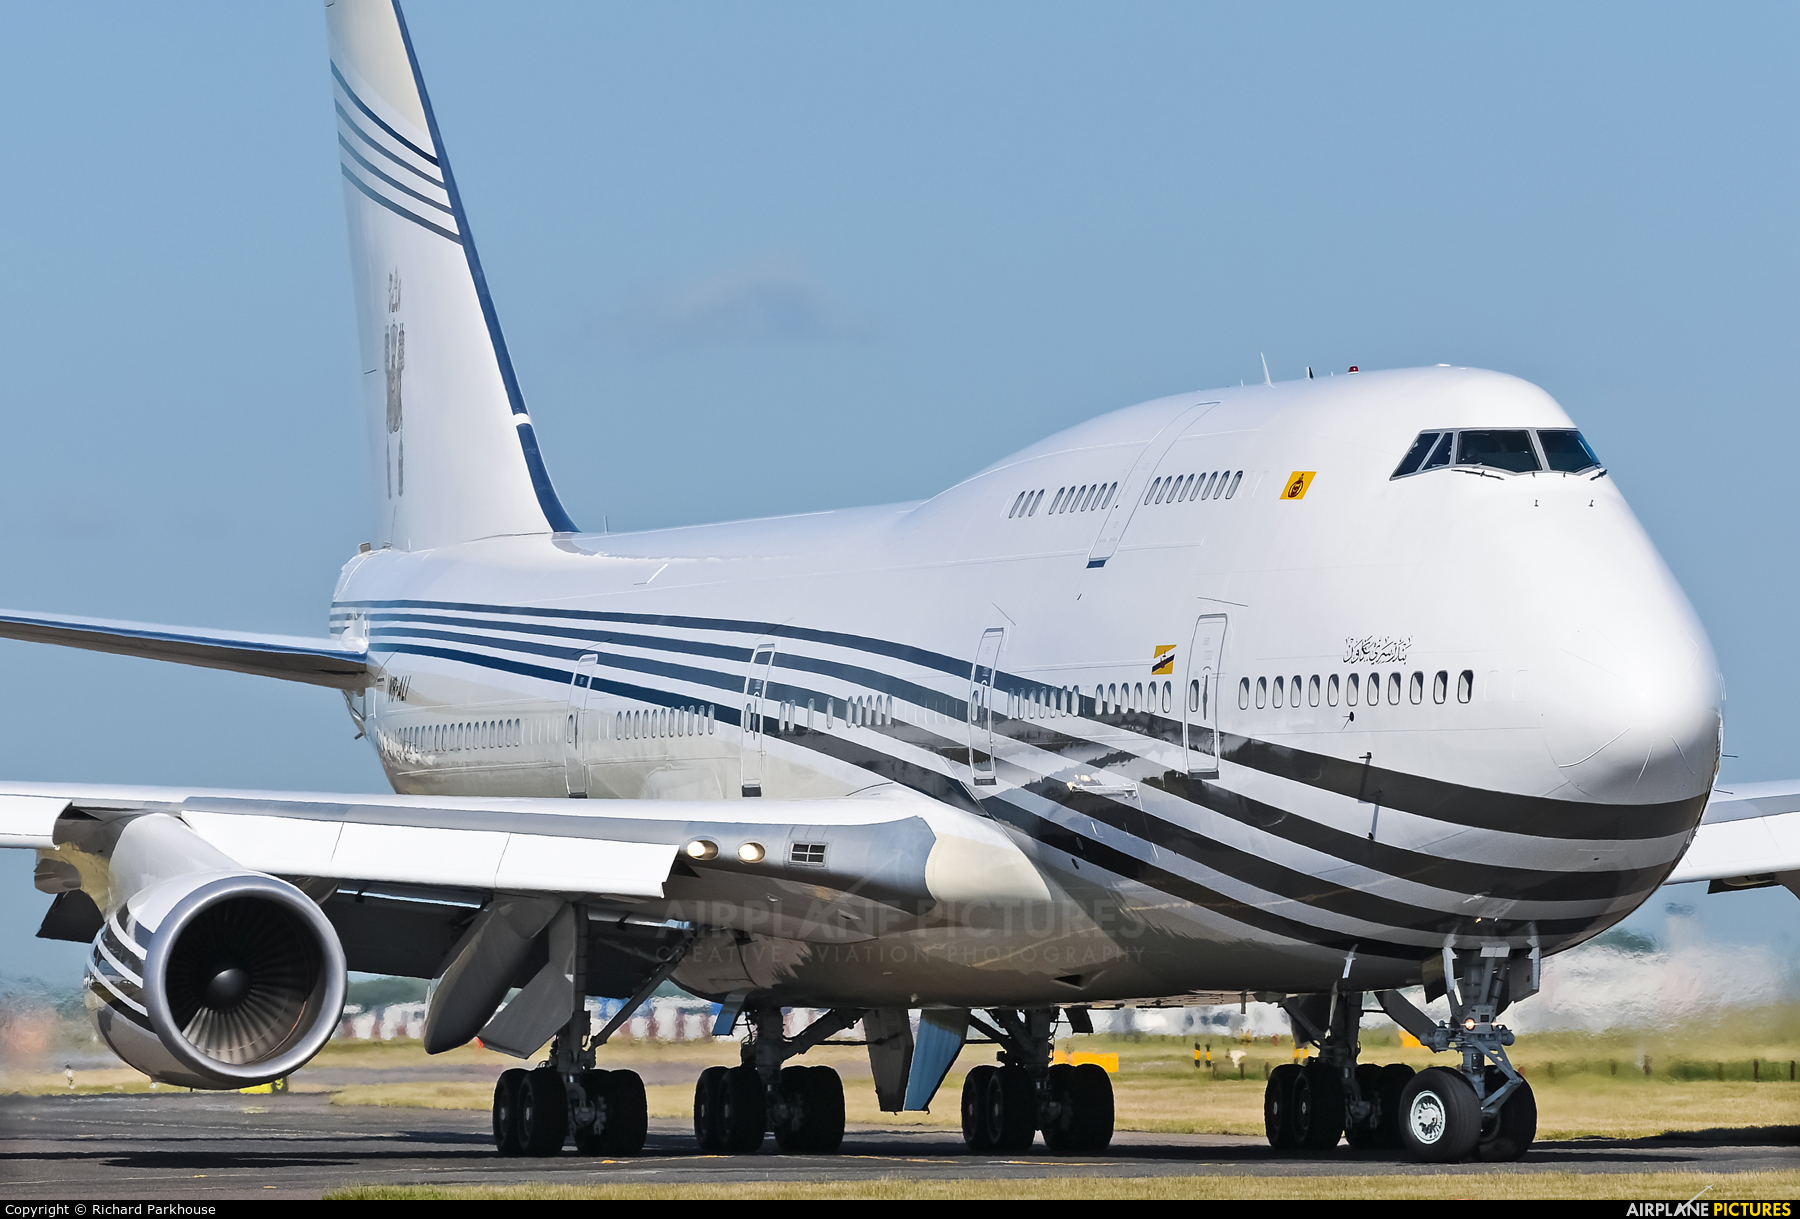 V8-ALI - Brunei Government Boeing 747-400 at London